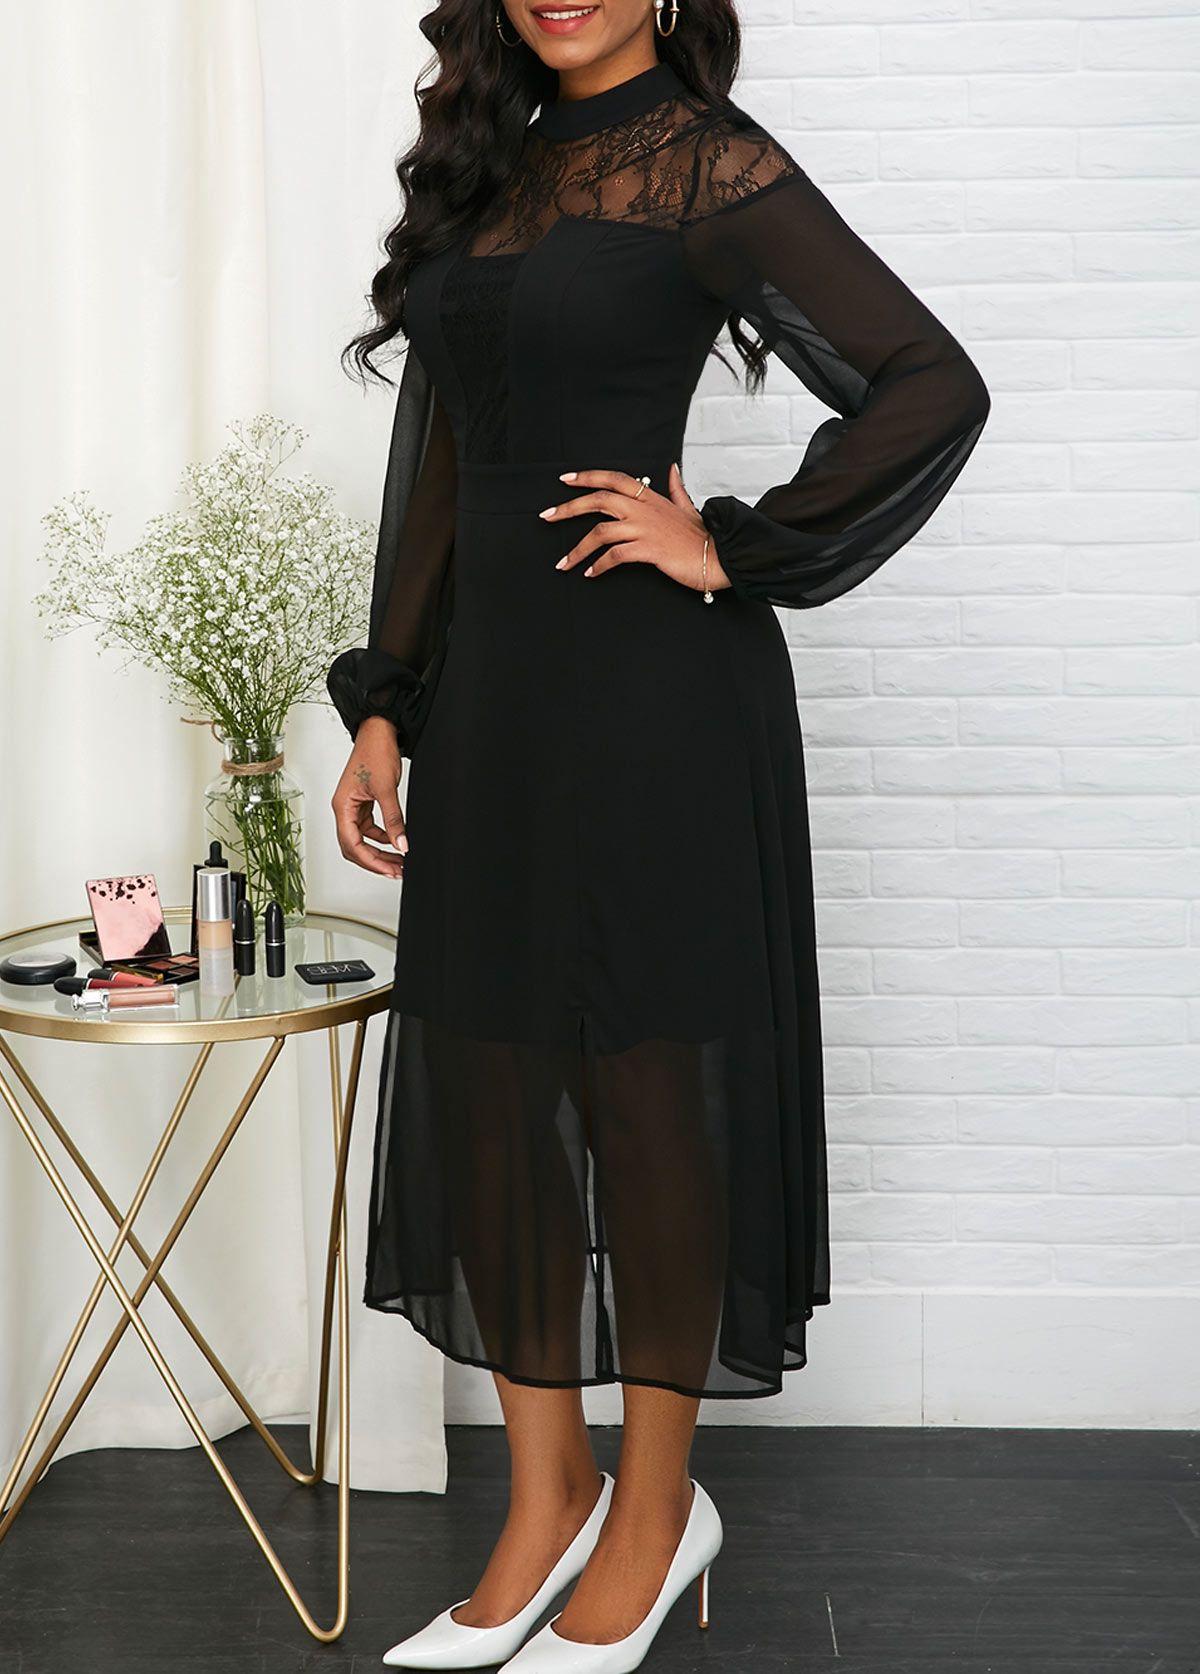 Mock Neck Lace Patchwork Long Sleeve Chiffon Dress Long Sleeve Chiffon Dress Black Chiffon Dress Pink High Low Dress [ 1674 x 1200 Pixel ]